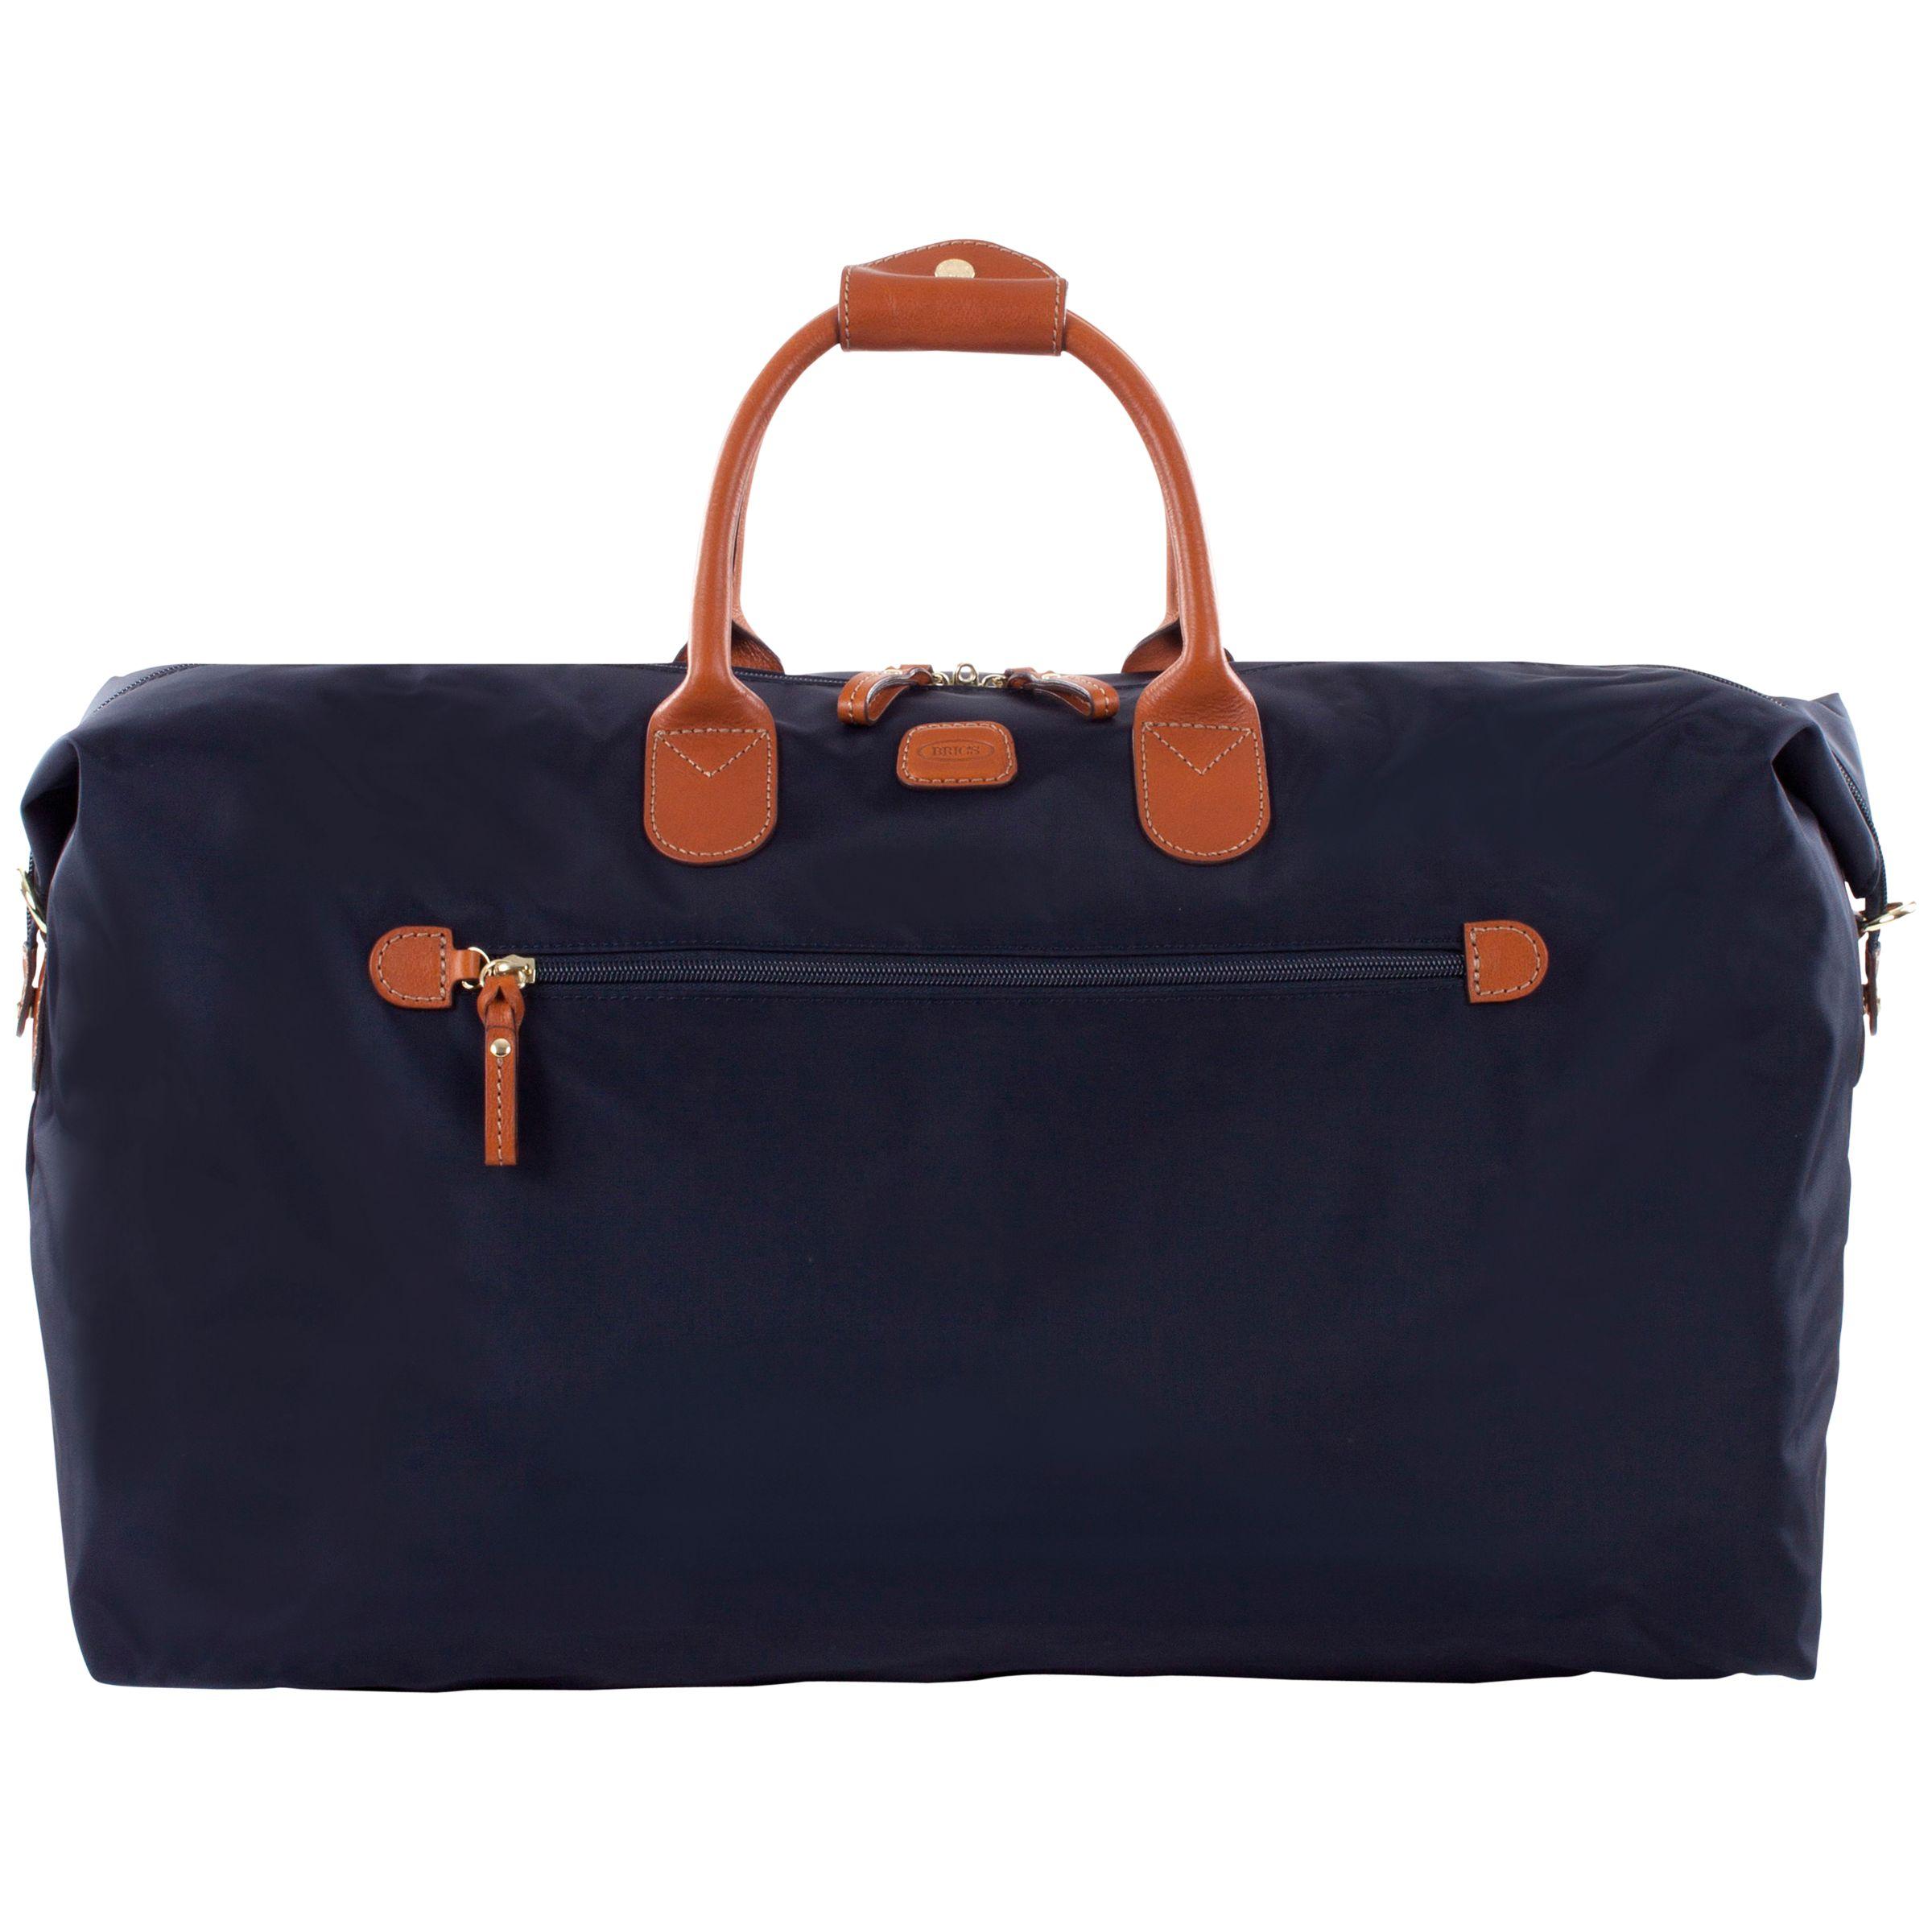 Bric's Bric's X Travel Nylon Leather Trim Medium Holdall, Blue